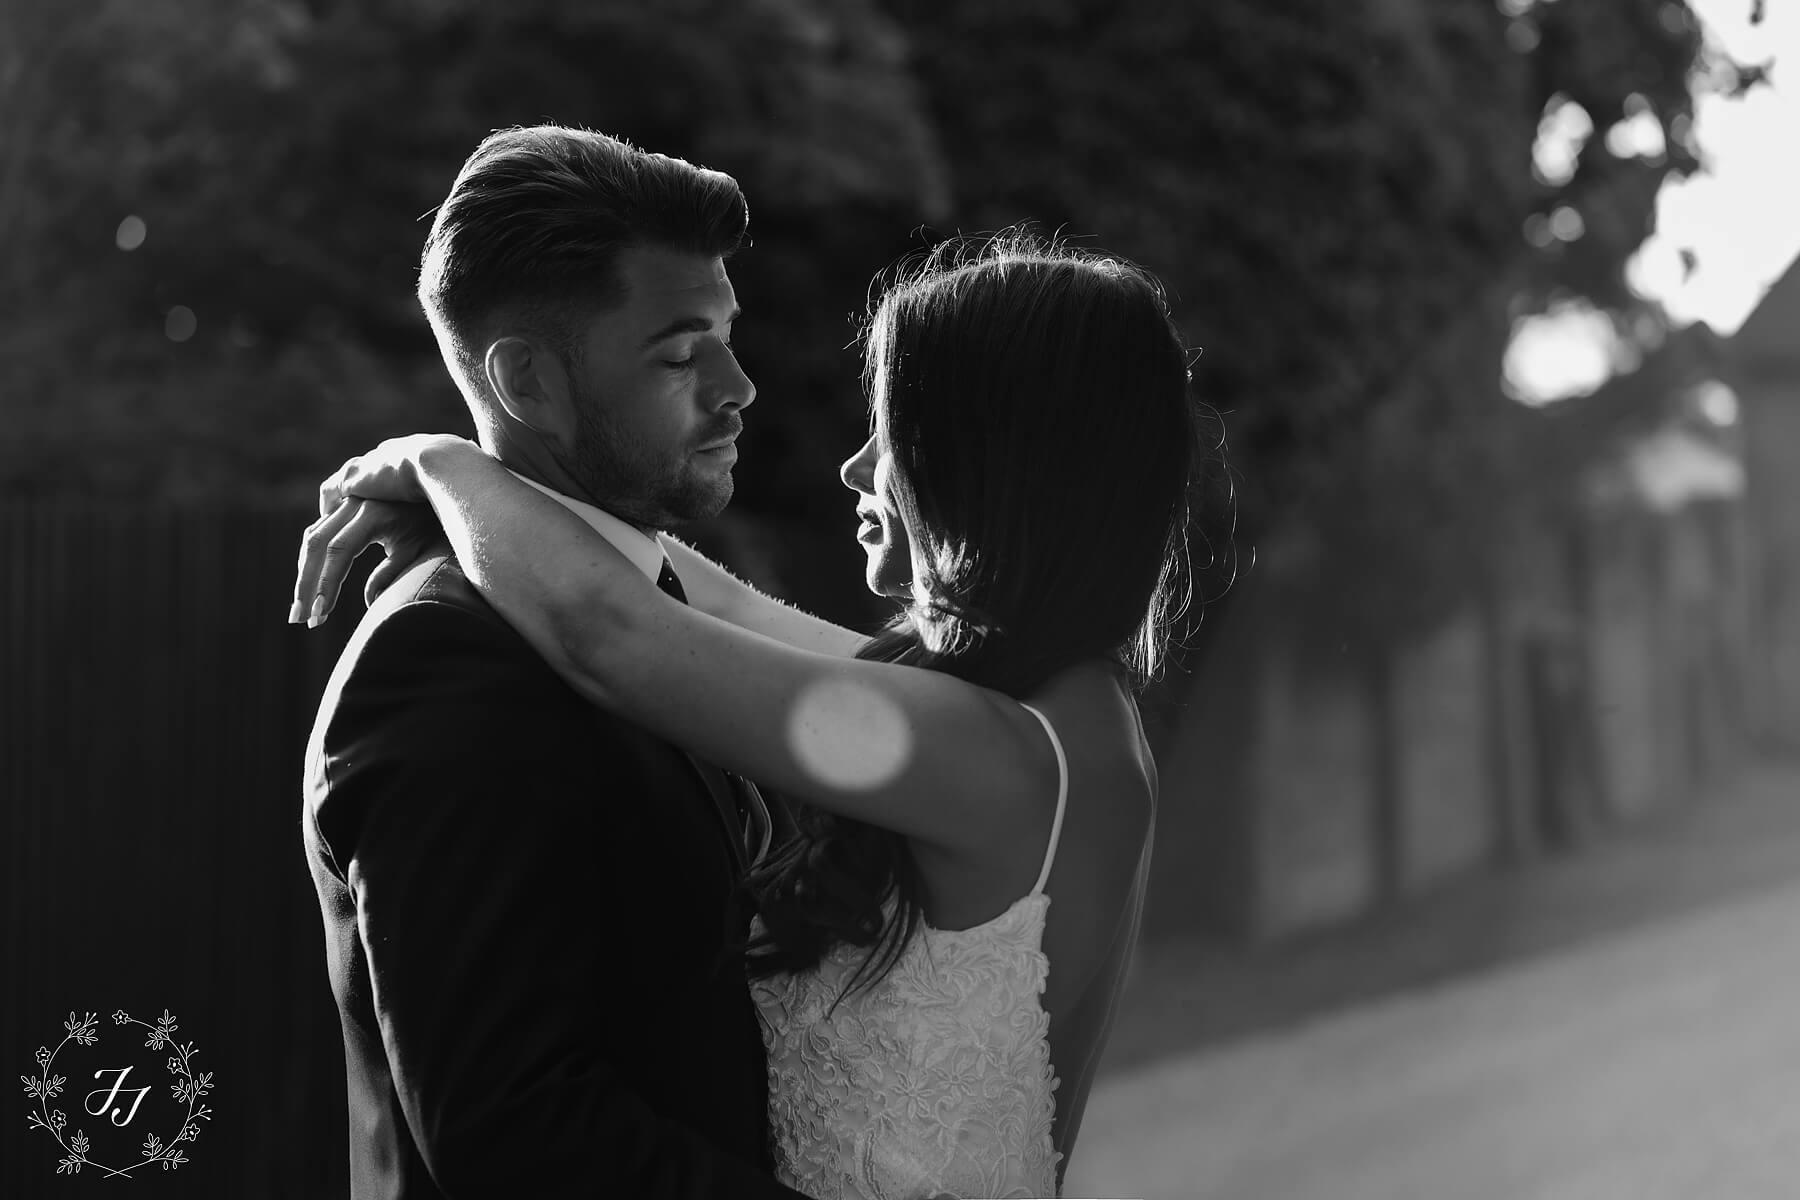 Samantha and Camerons wedding photography by jasmine jade